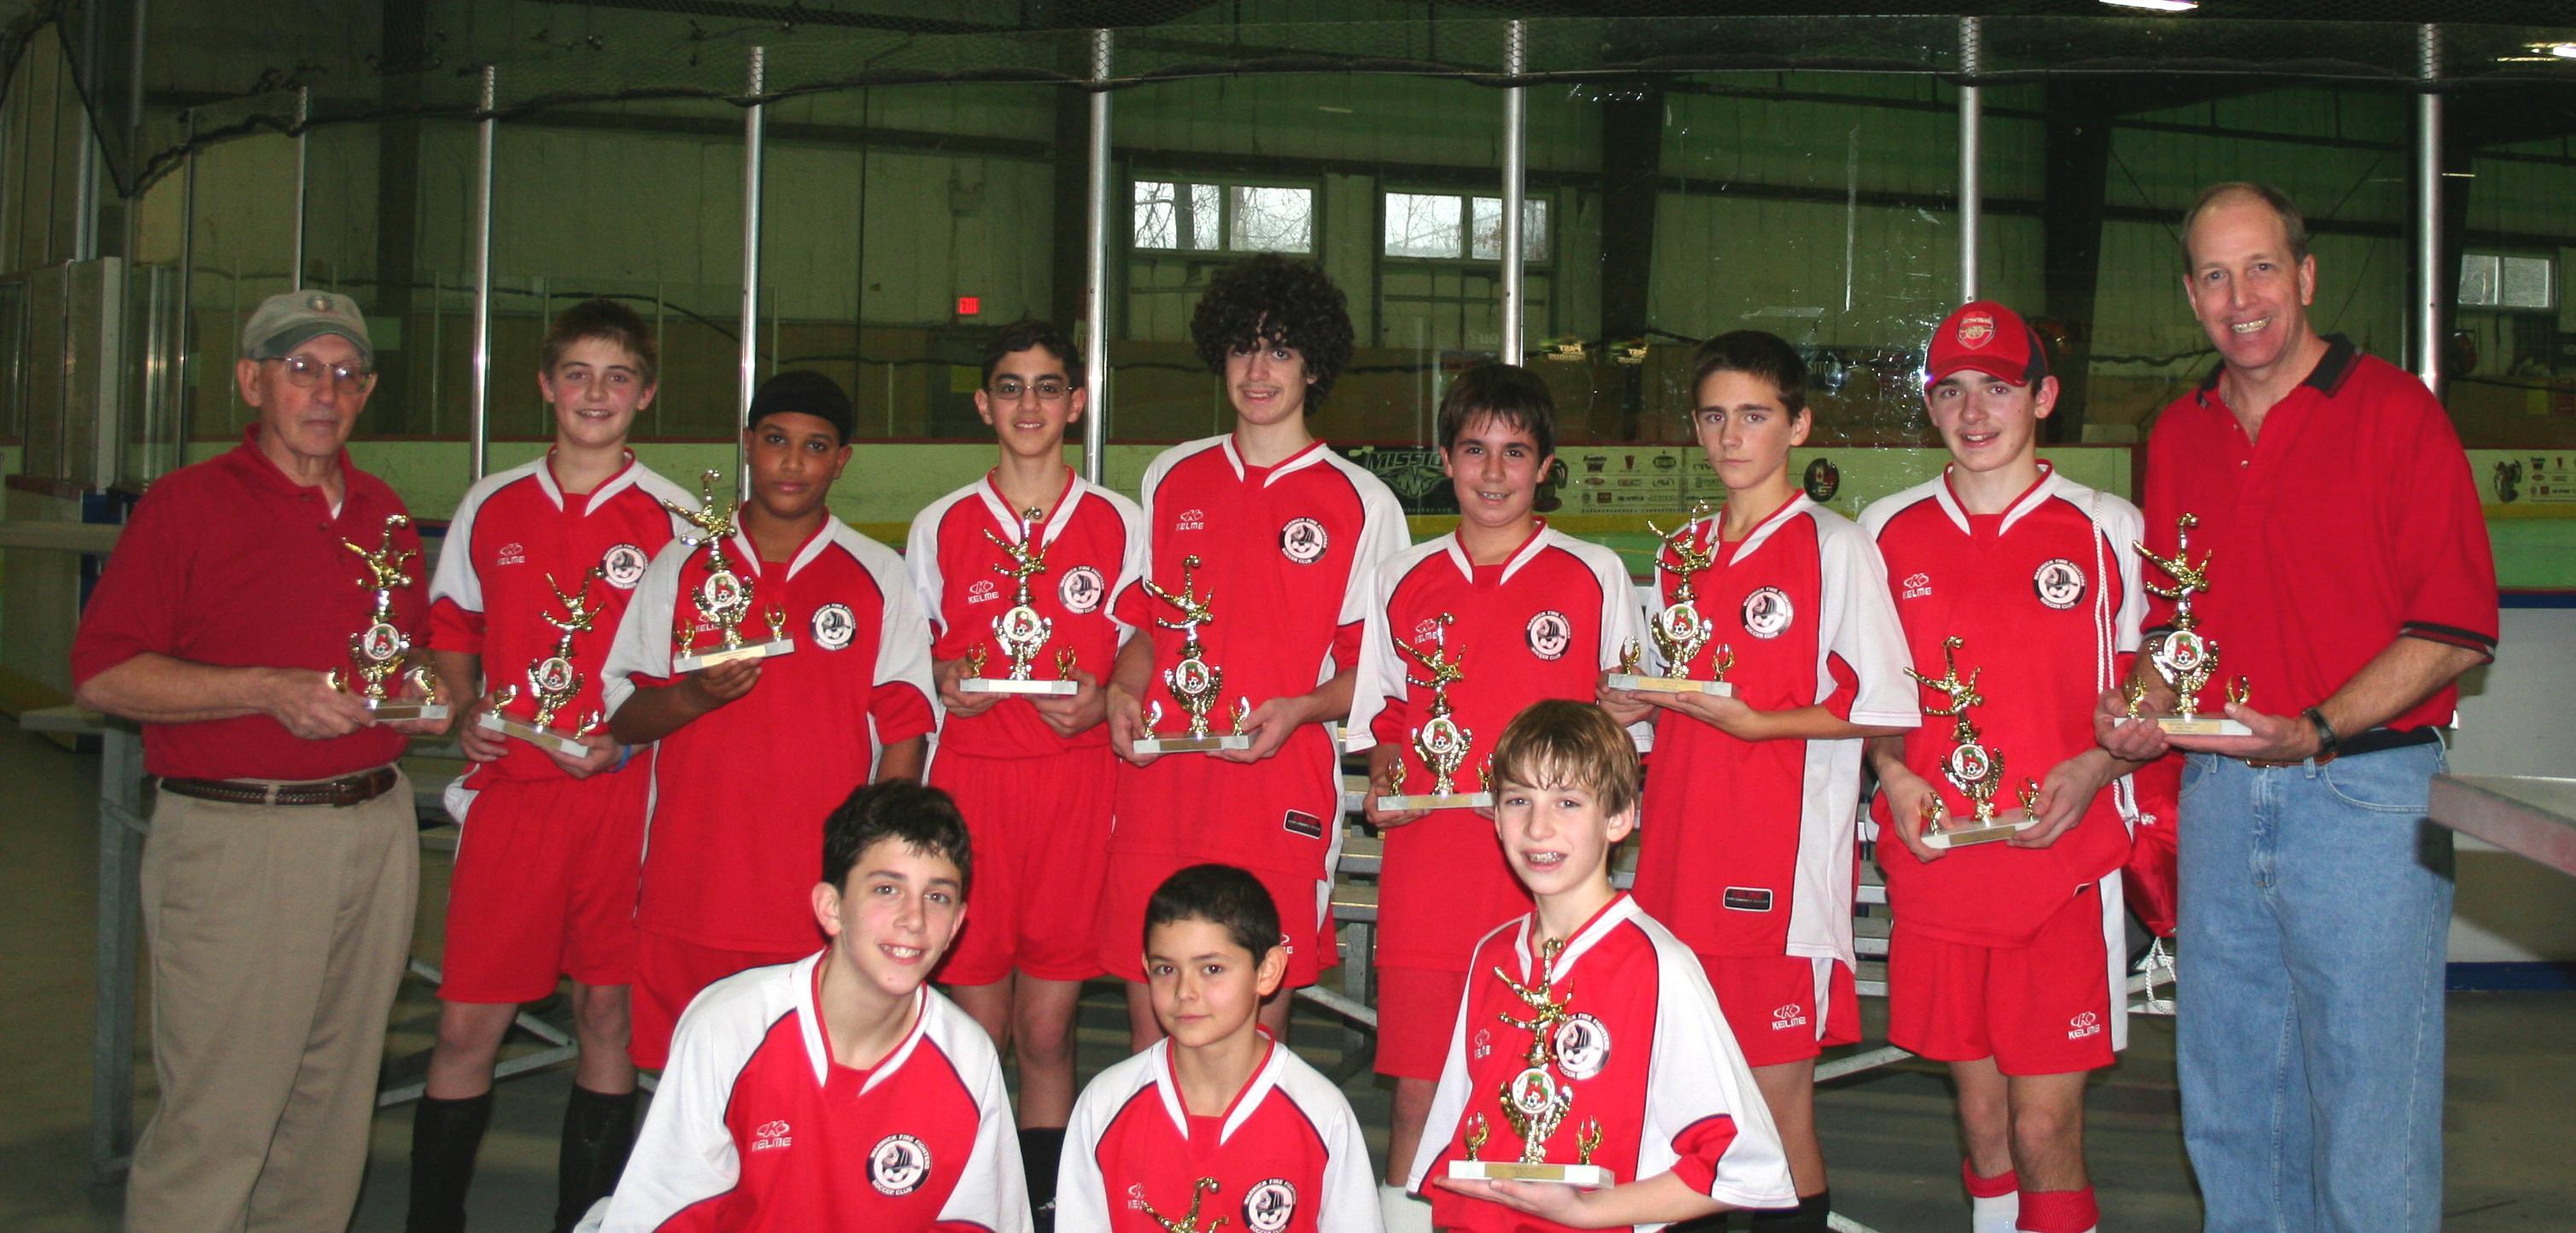 WFFSC U14 Boys 2006 Holiday Tournament